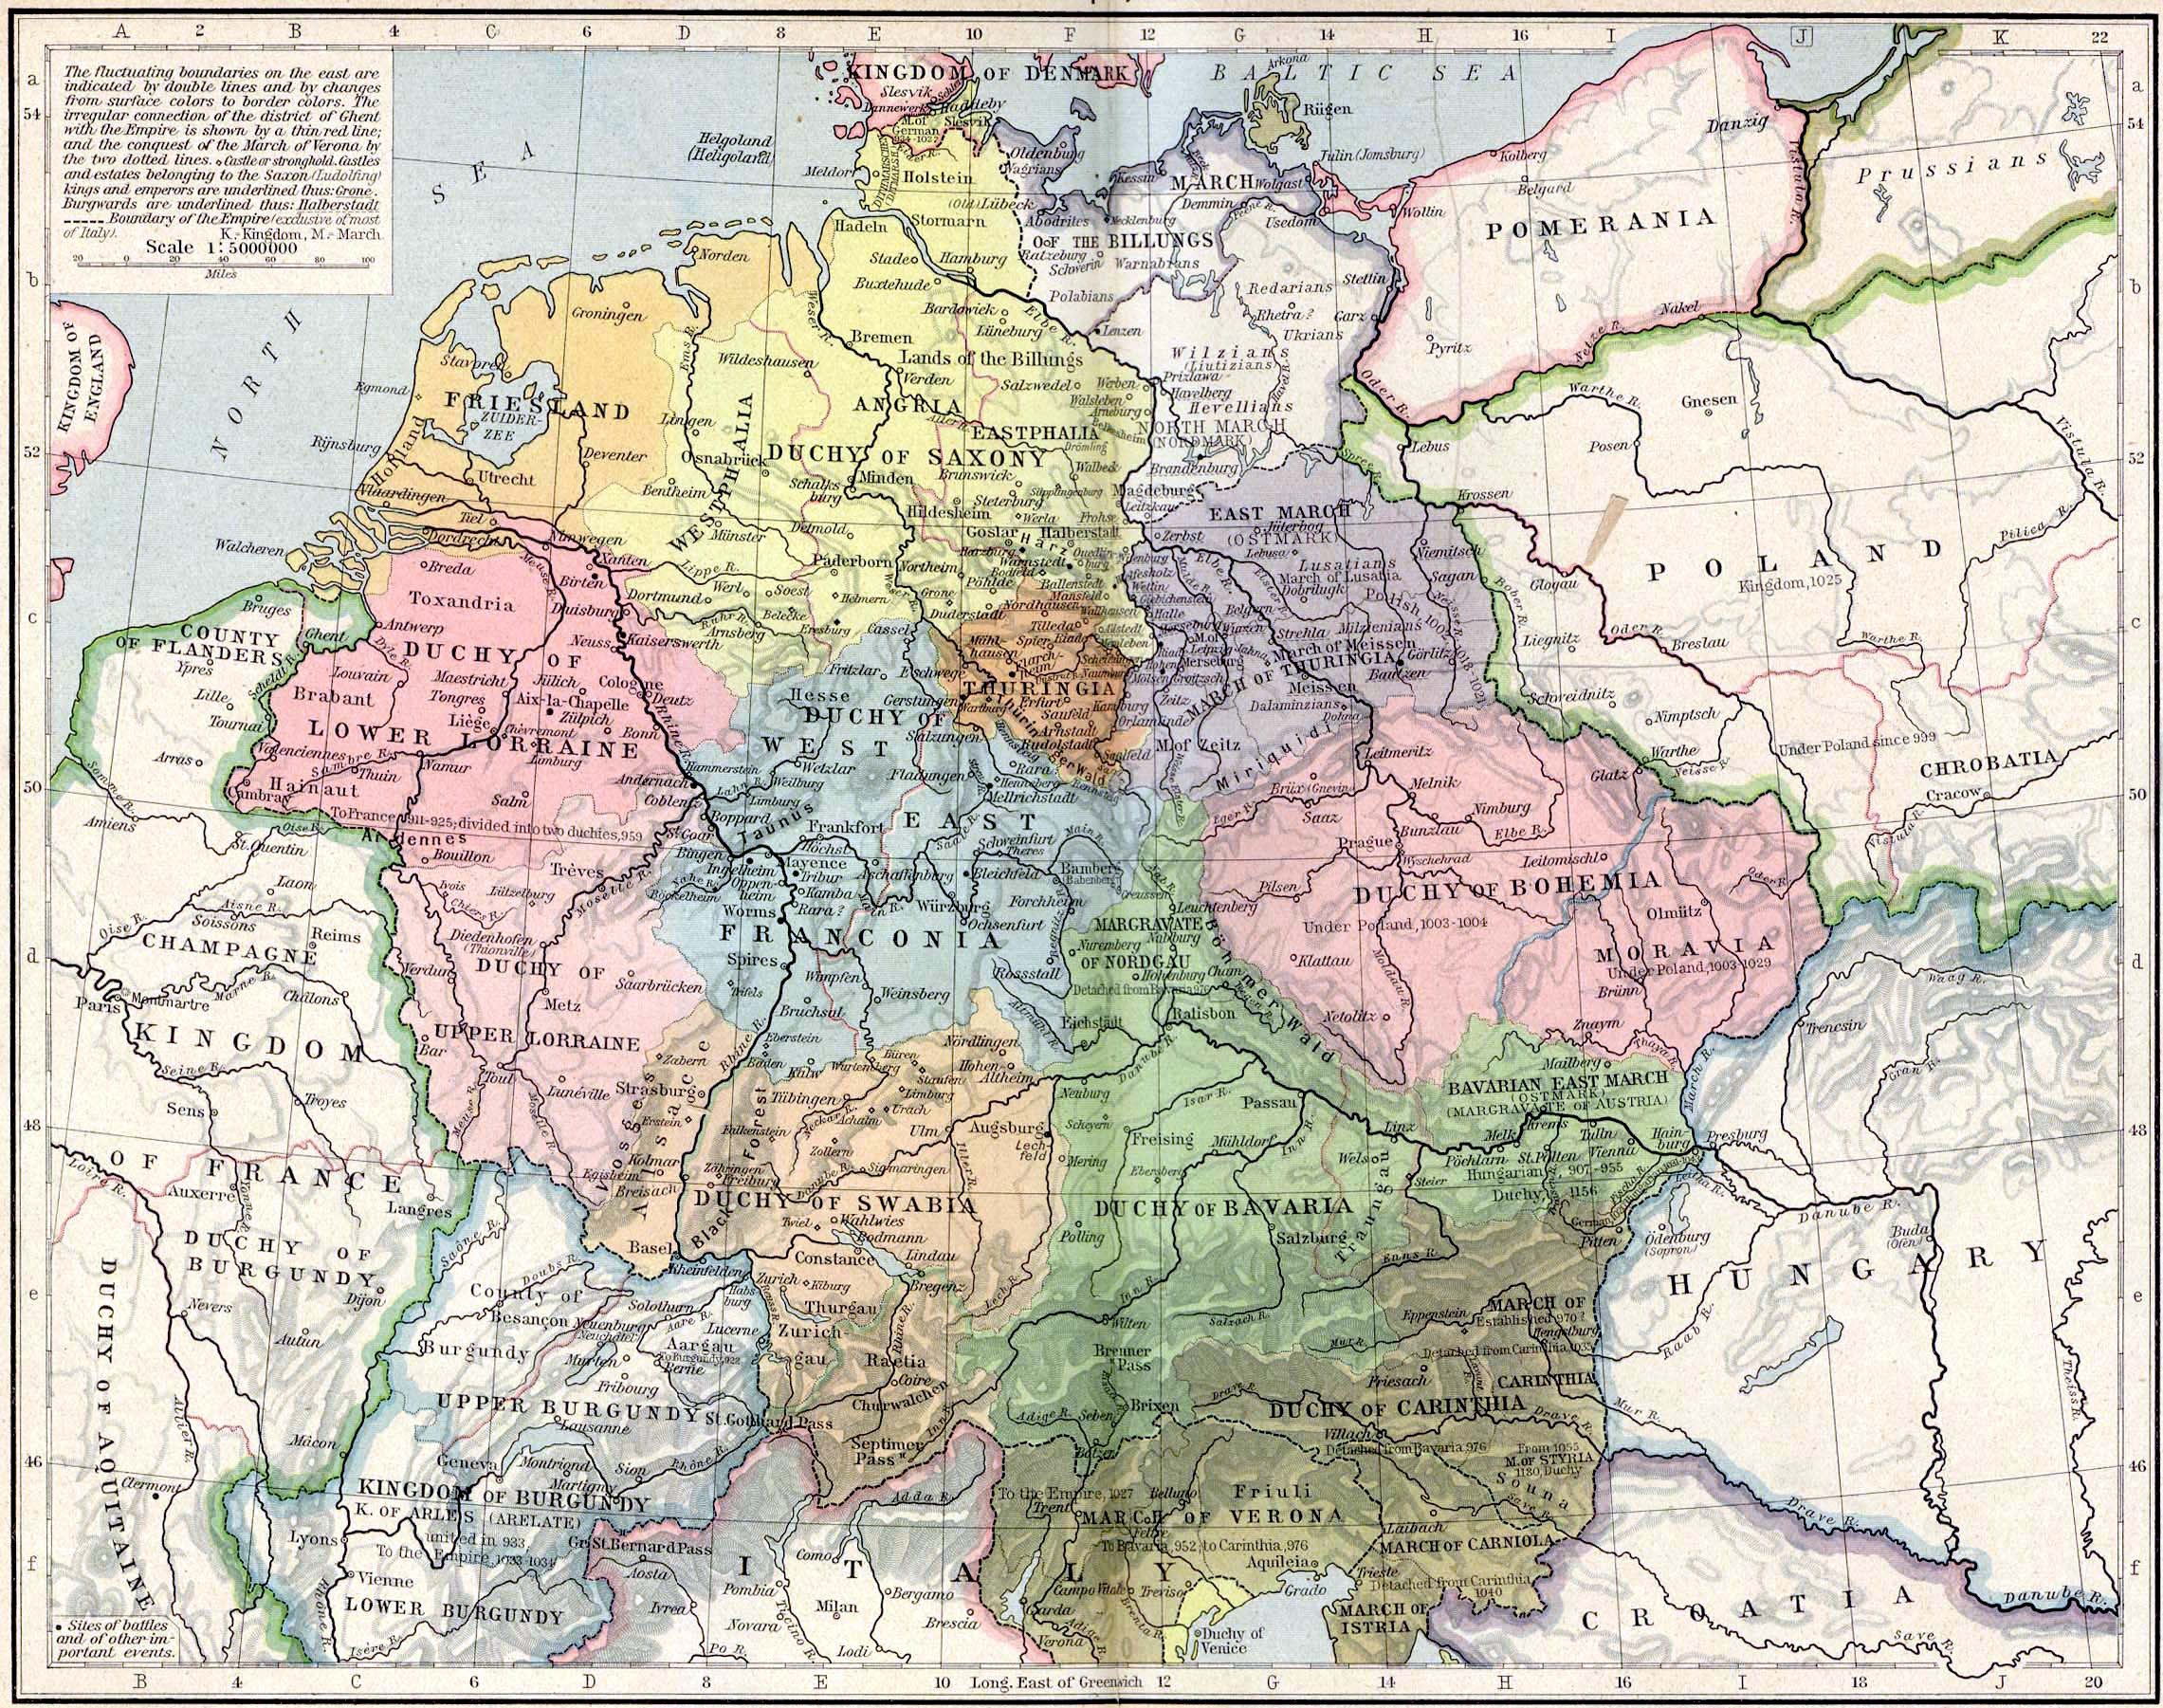 https://upload.wikimedia.org/wikipedia/commons/1/11/Central_Europe%2C_919-1125.jpg